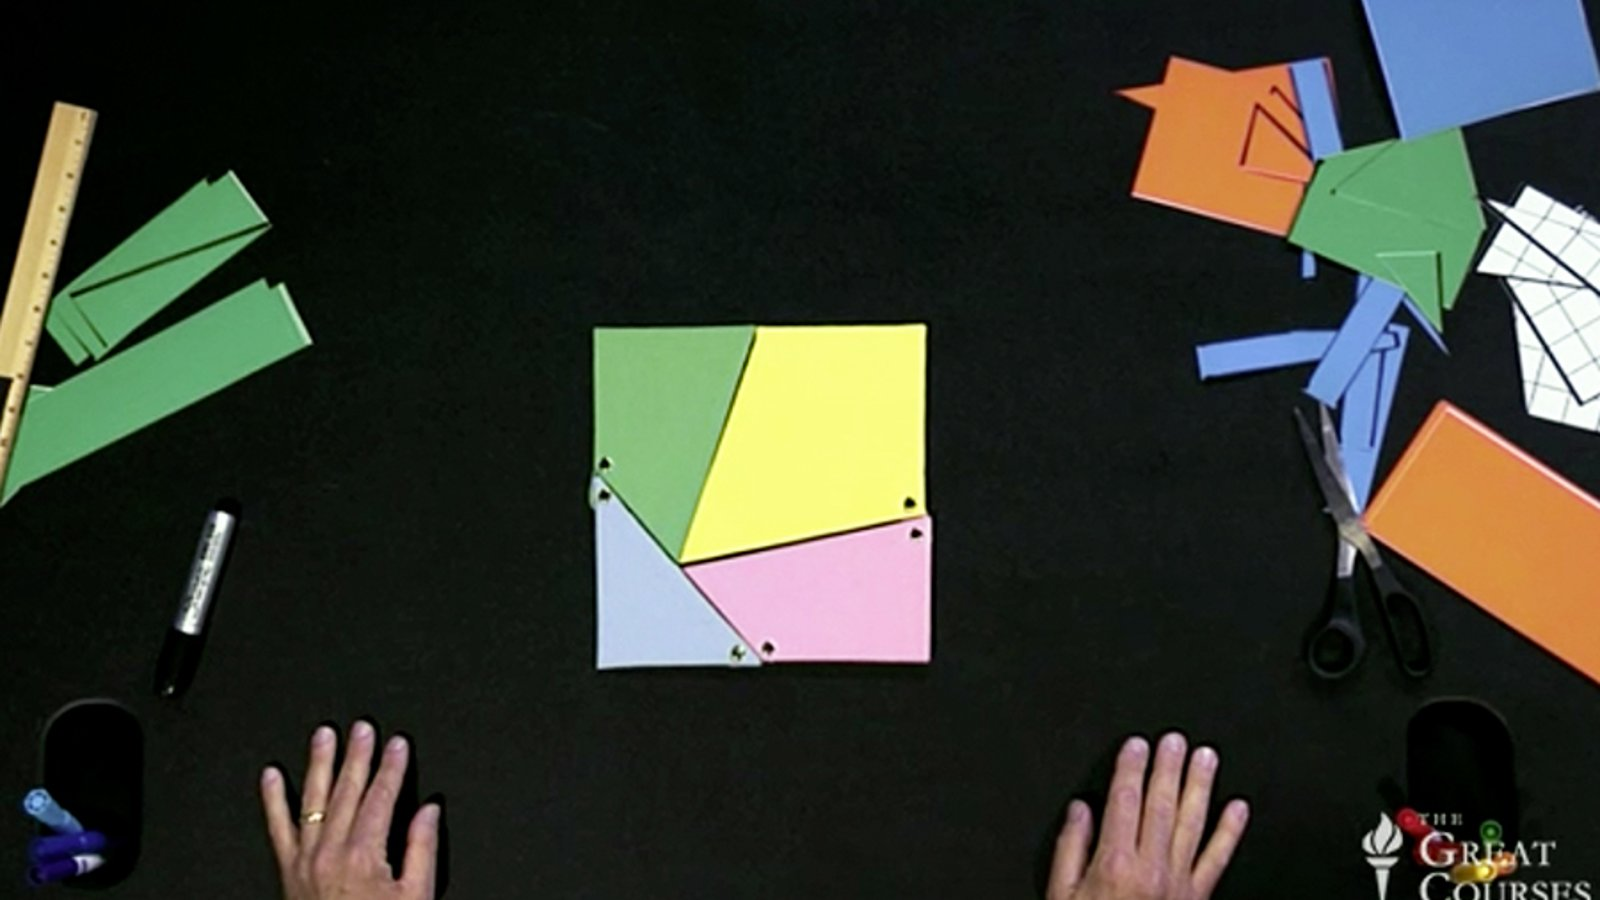 Visualizing Area Formulas